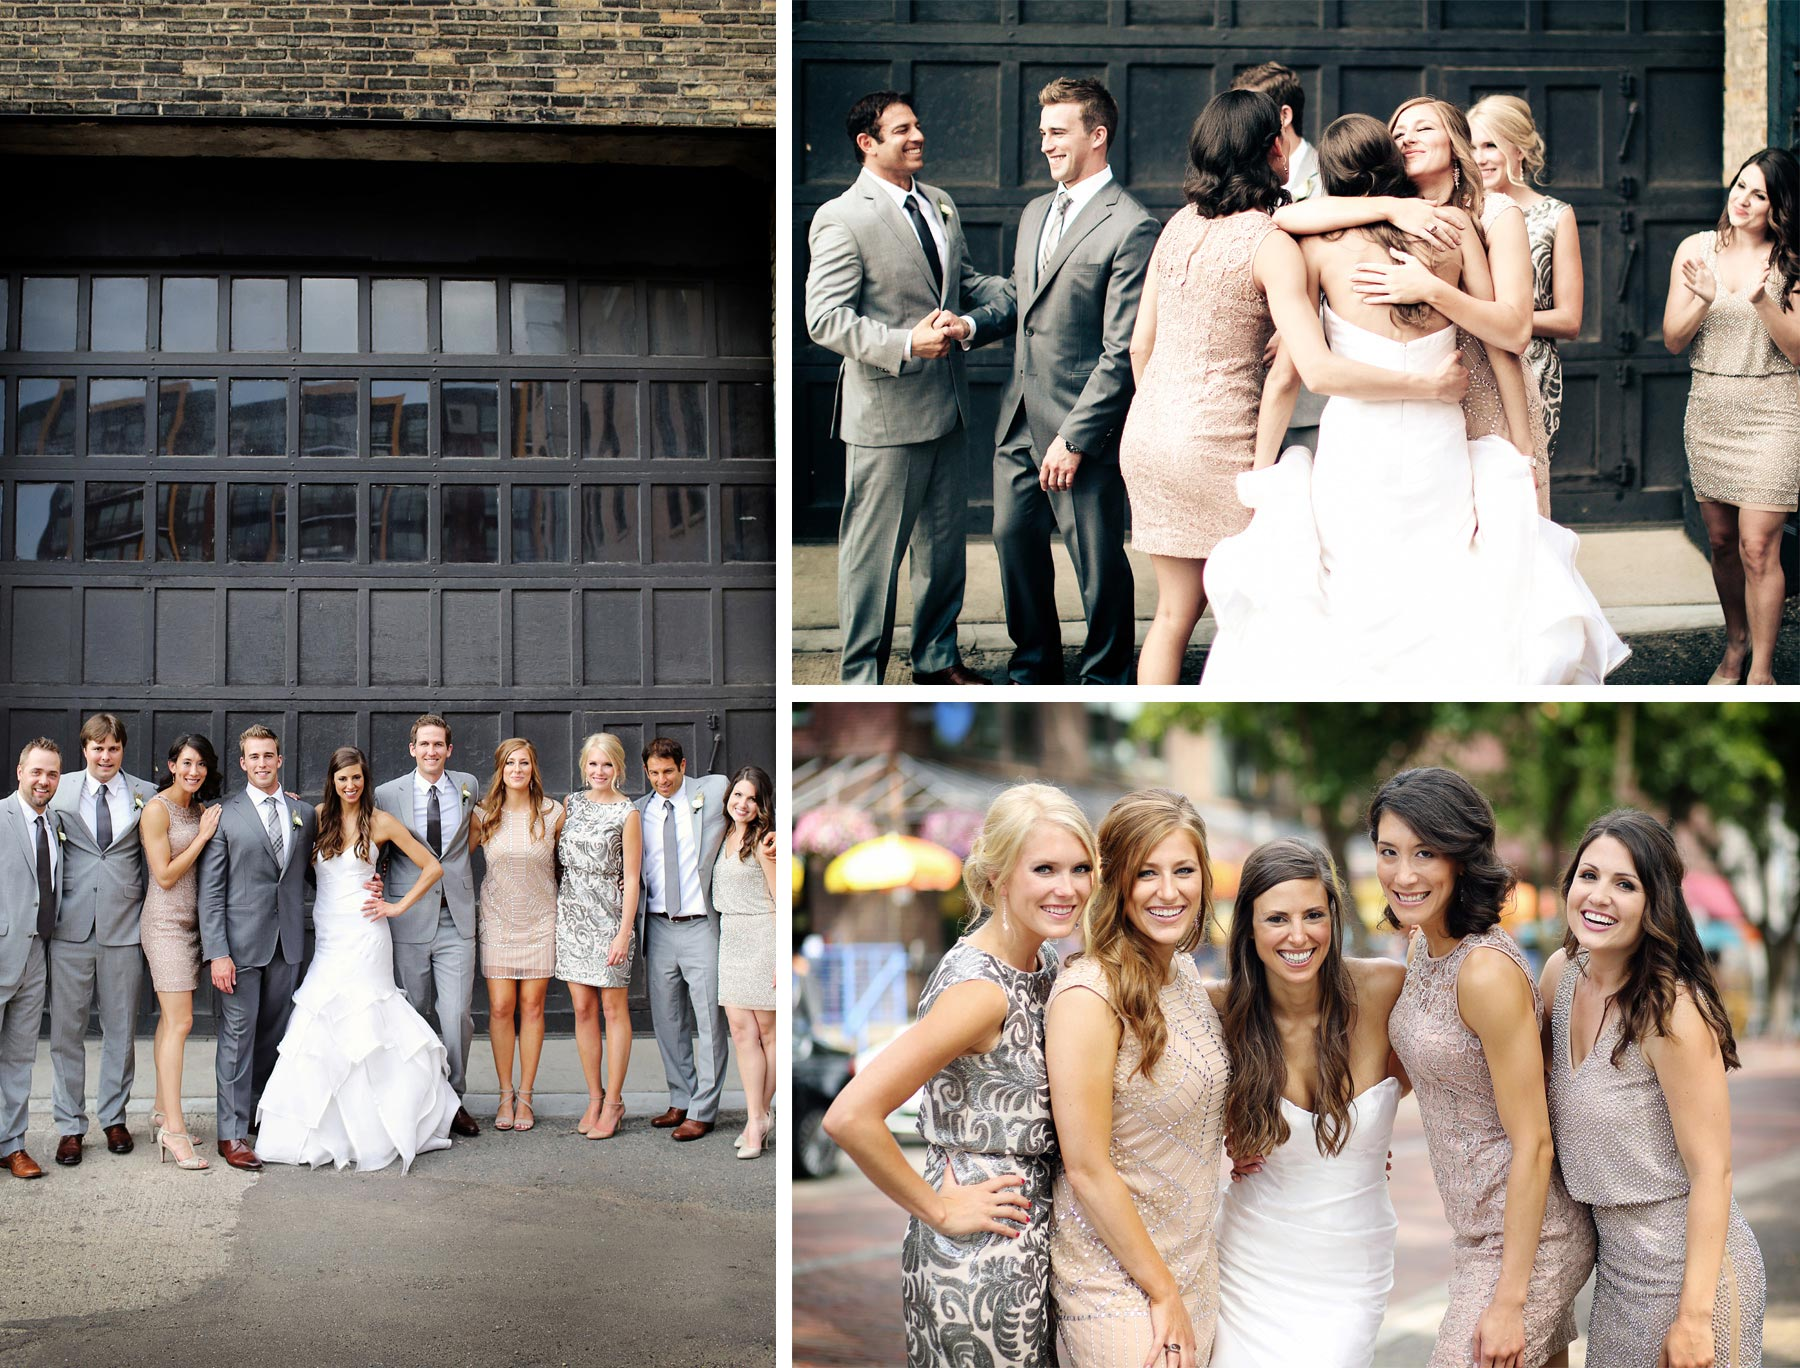 13-Minneapolis-Minnesota-Wedding-Photography-by-Vick-Photography-Aria-Wedding-Party-Downtown-Katie-&-Joe.jpg